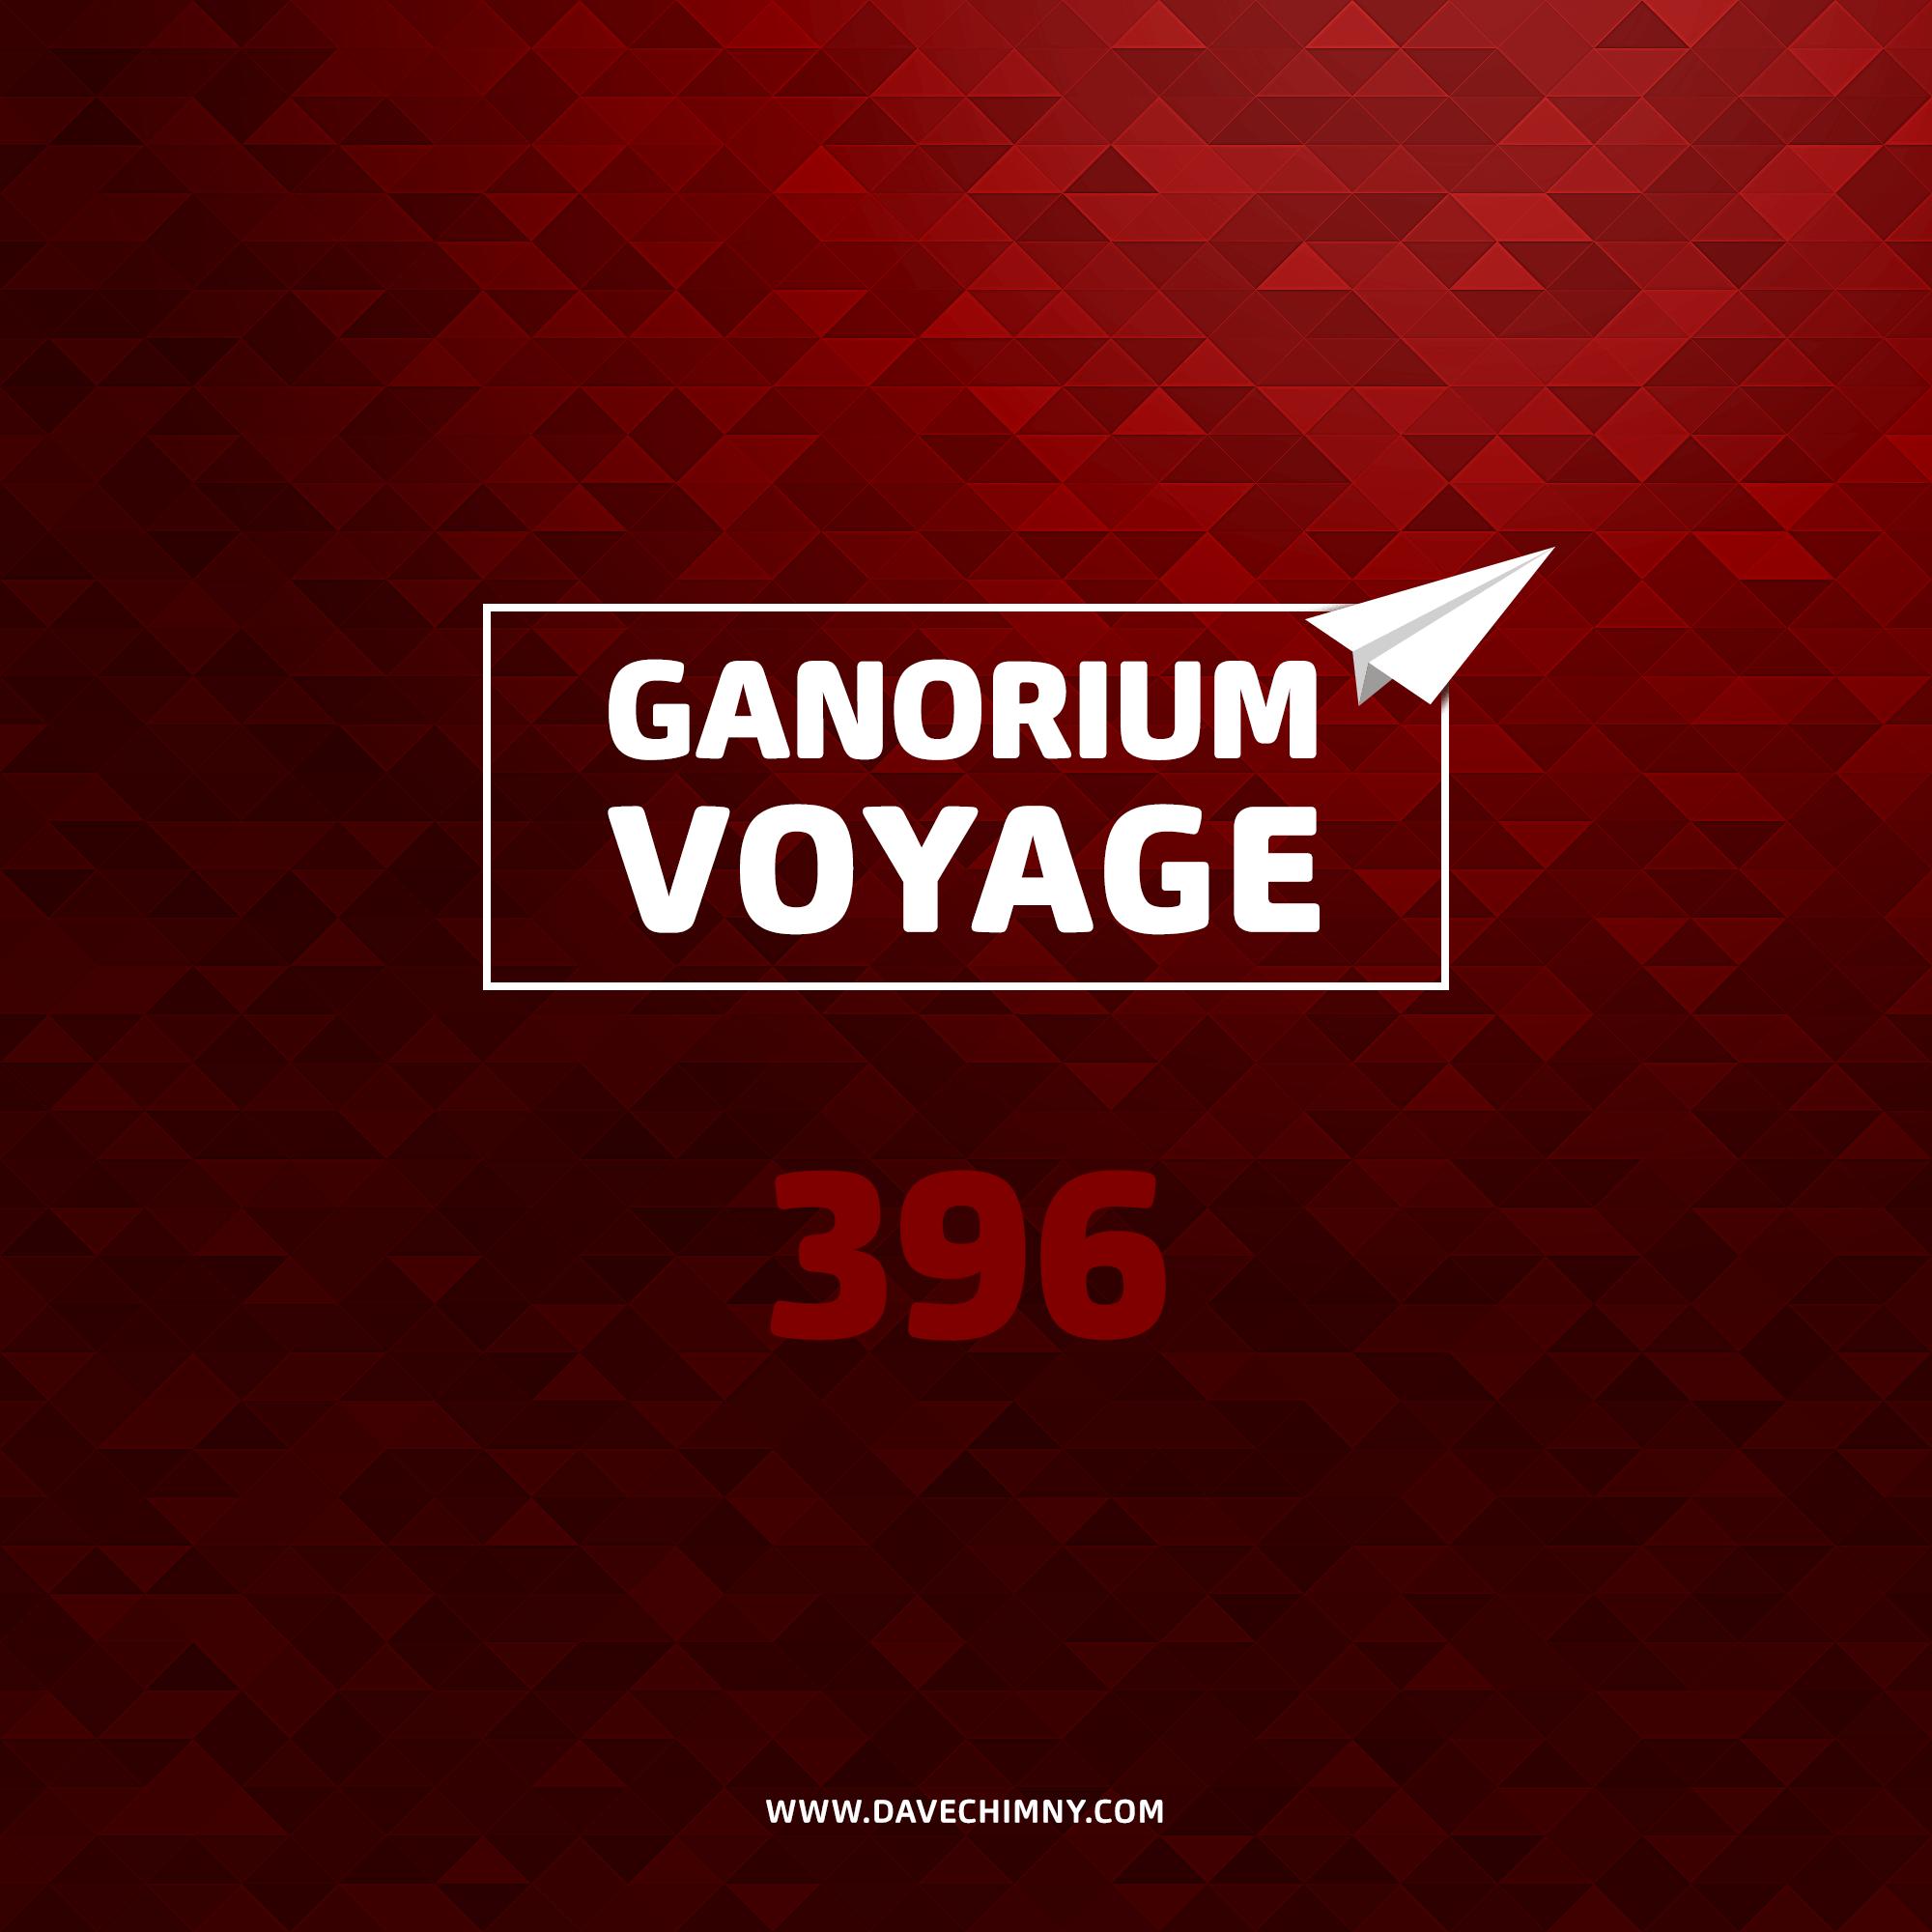 Dave Chimny - Ganorium Voyage 396